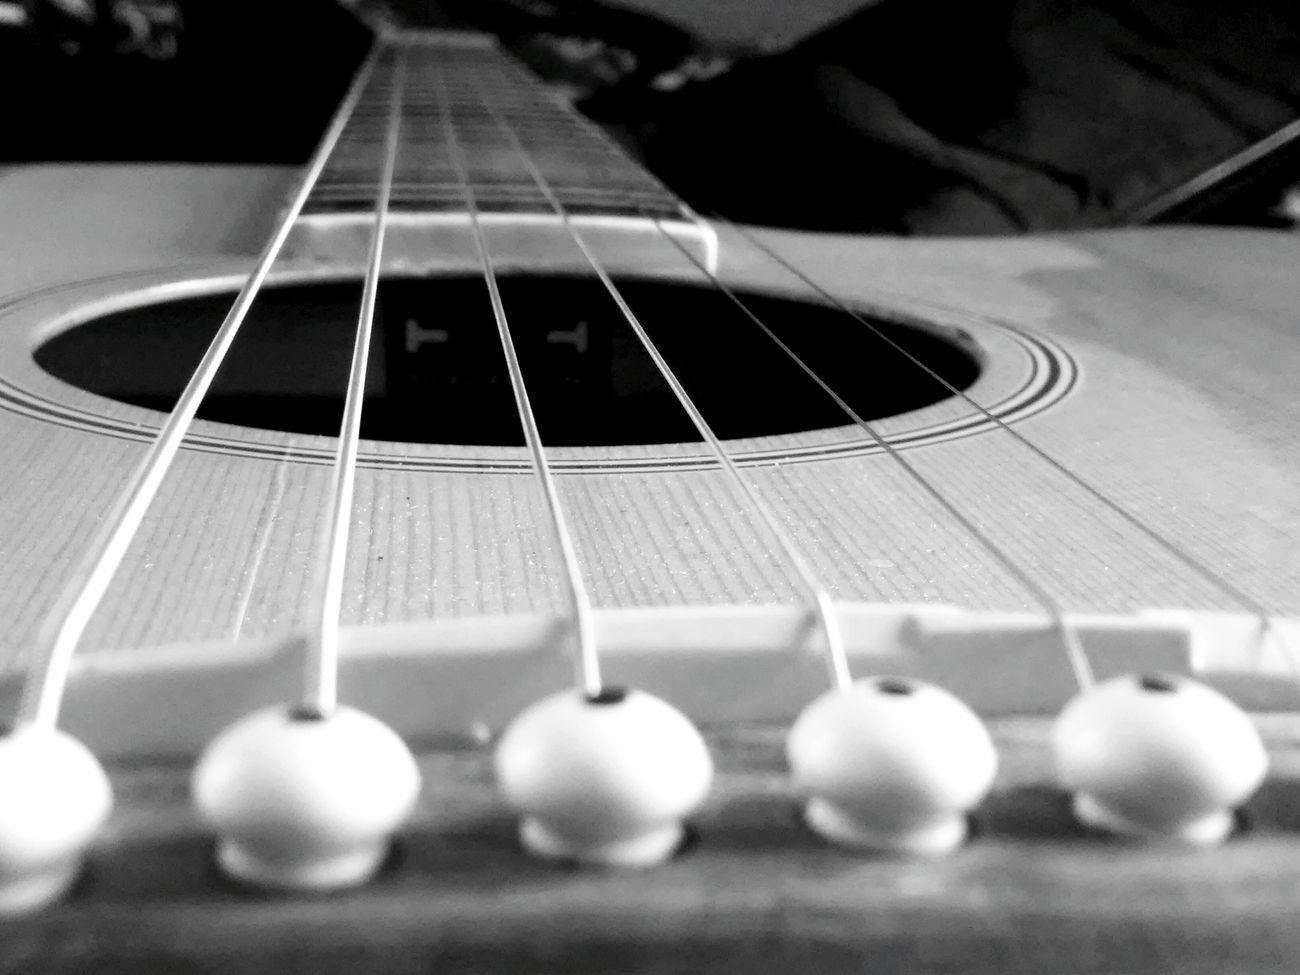 Gitarımın Telleri 🎸 Relaxing Hi! Taking Photos First Eyeem Photo Enjoying Life Guitar ıbanez Guitars The Human Condition Gitar Music